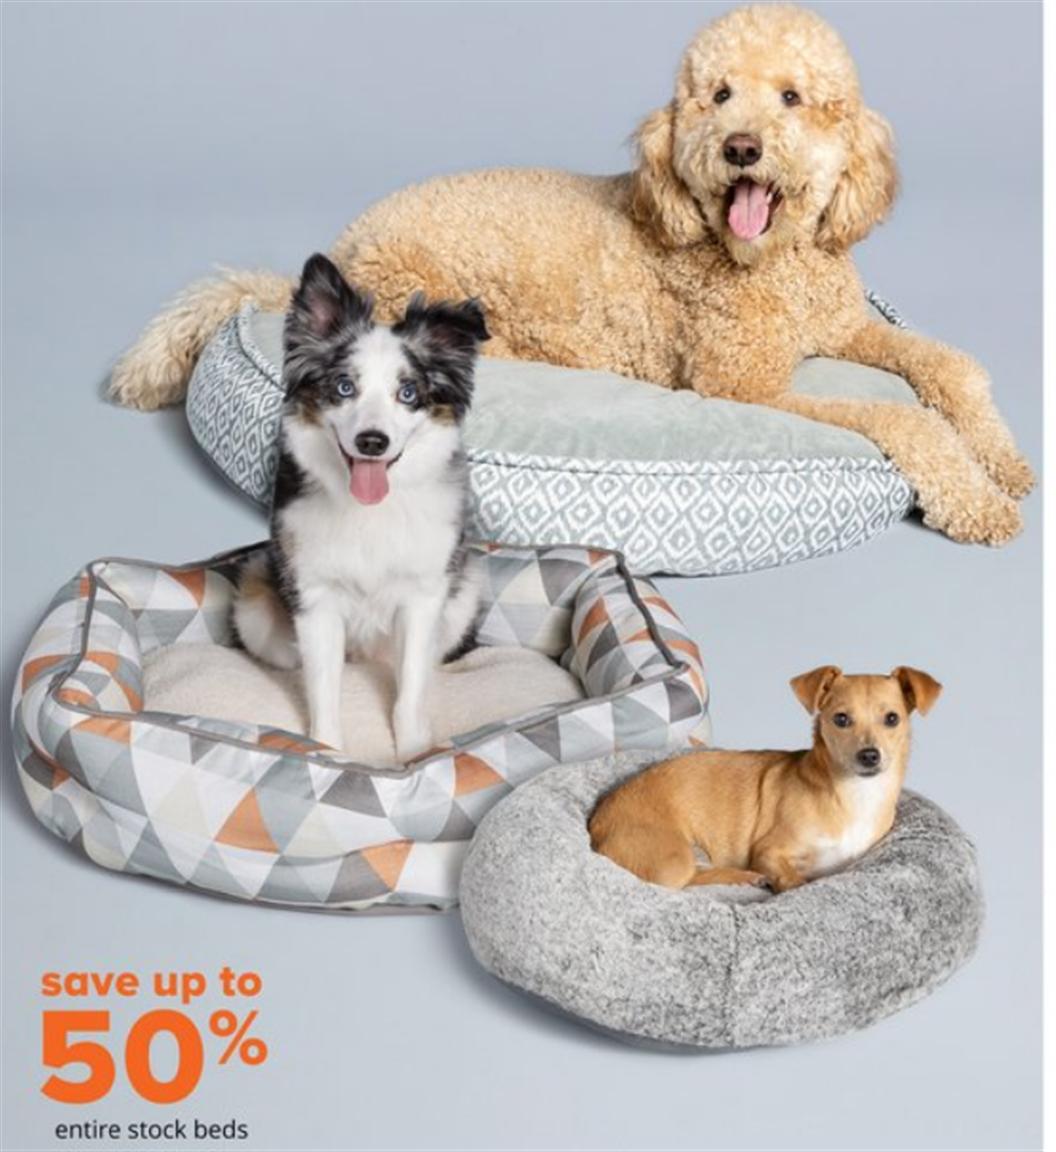 Petsmart.com – Up to 50% off Beds & Furniture!